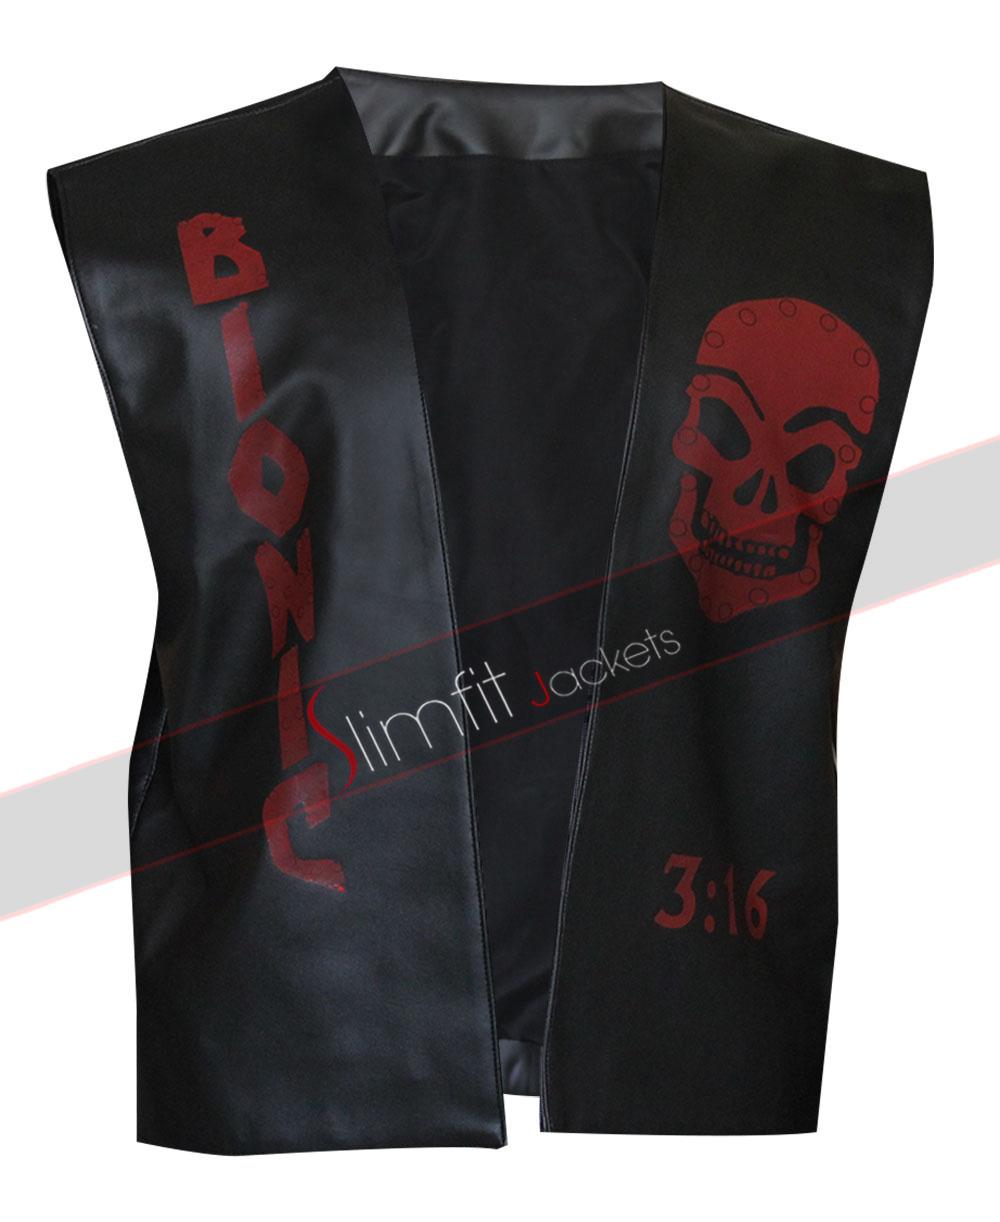 Chris Jericho Light Up Replica Wwe Y2j Leather Jacket